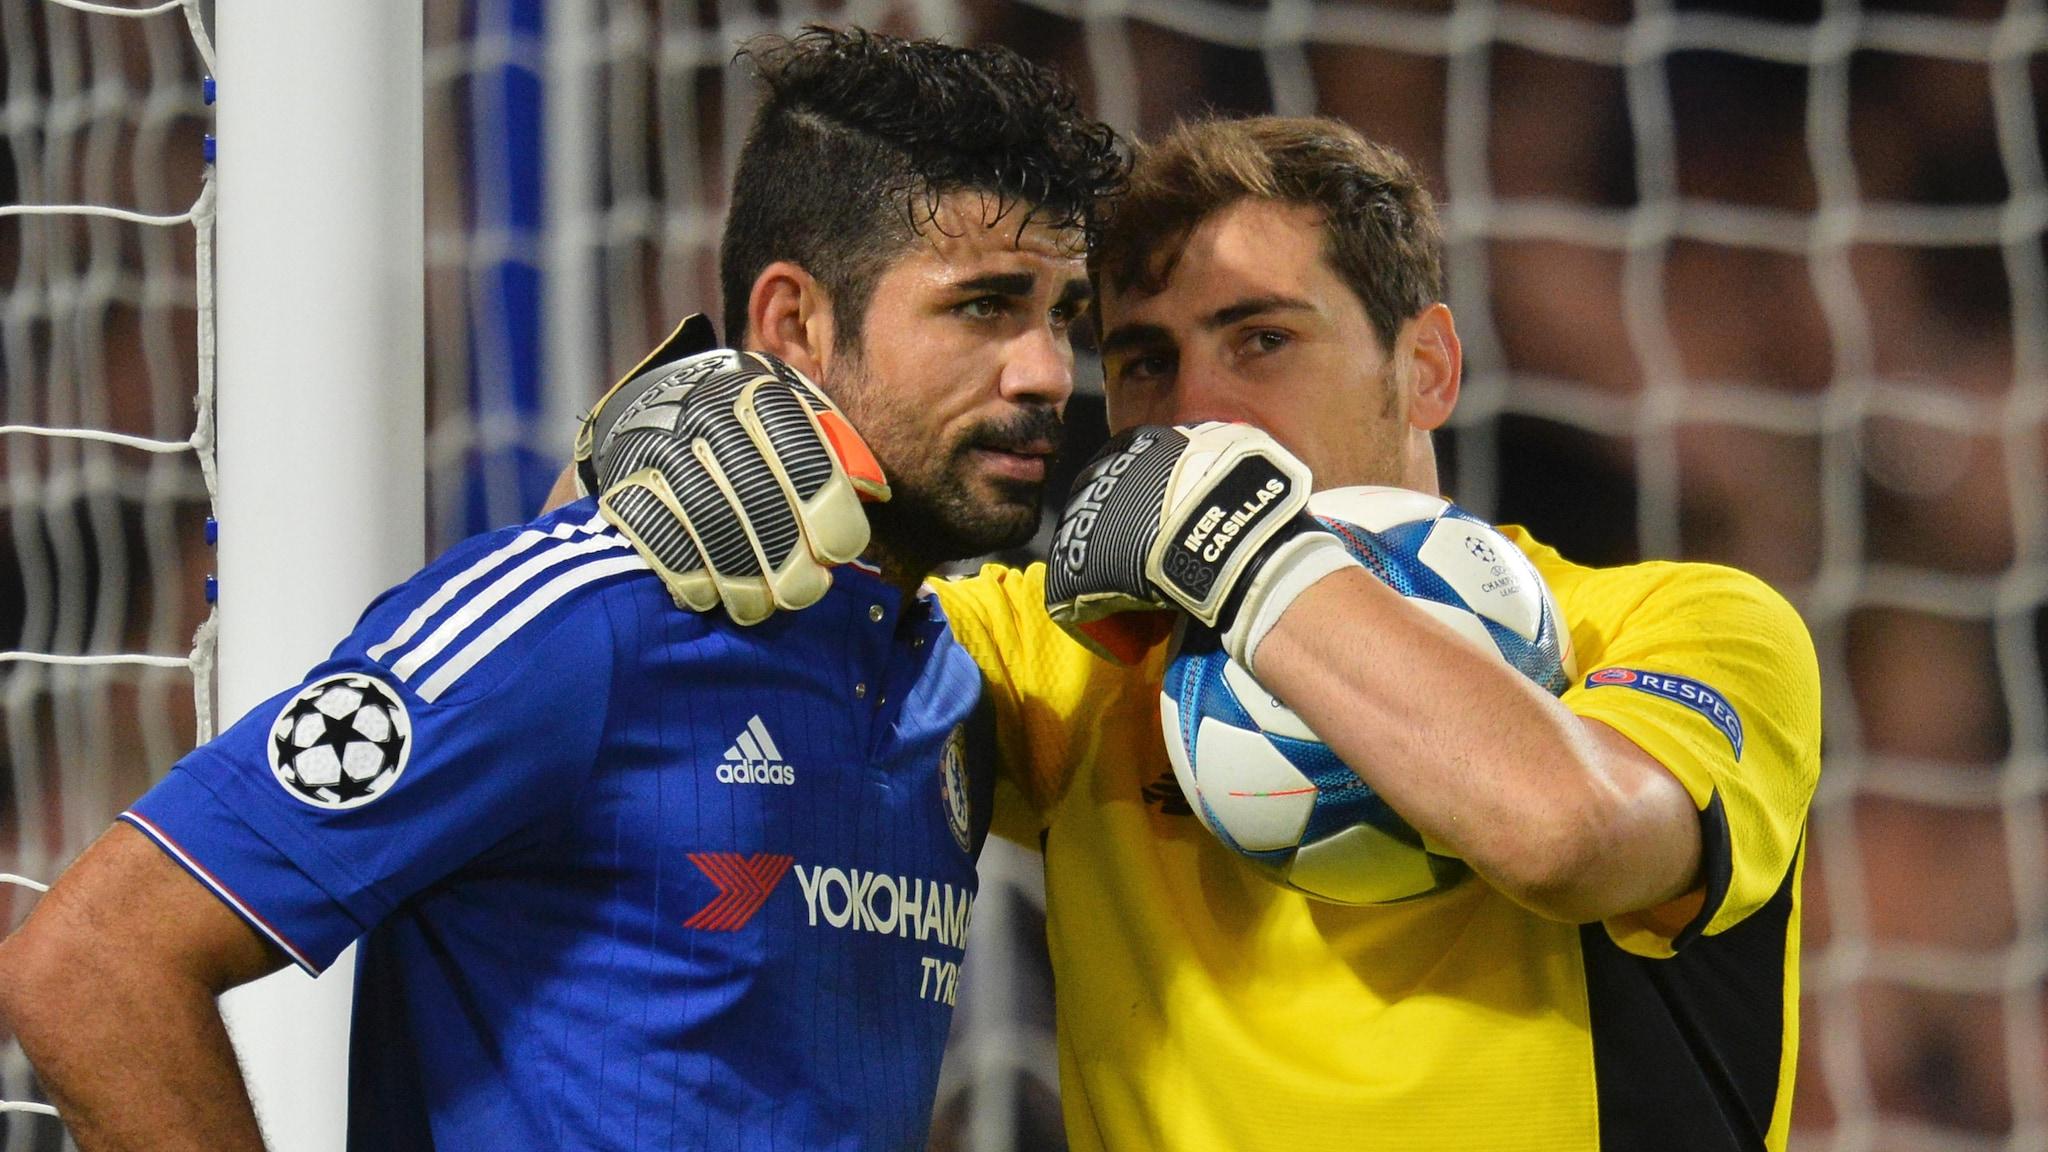 FC Porto 2 - 1 Chelsea - Match Report & Highlights  |Porto- Chelsea